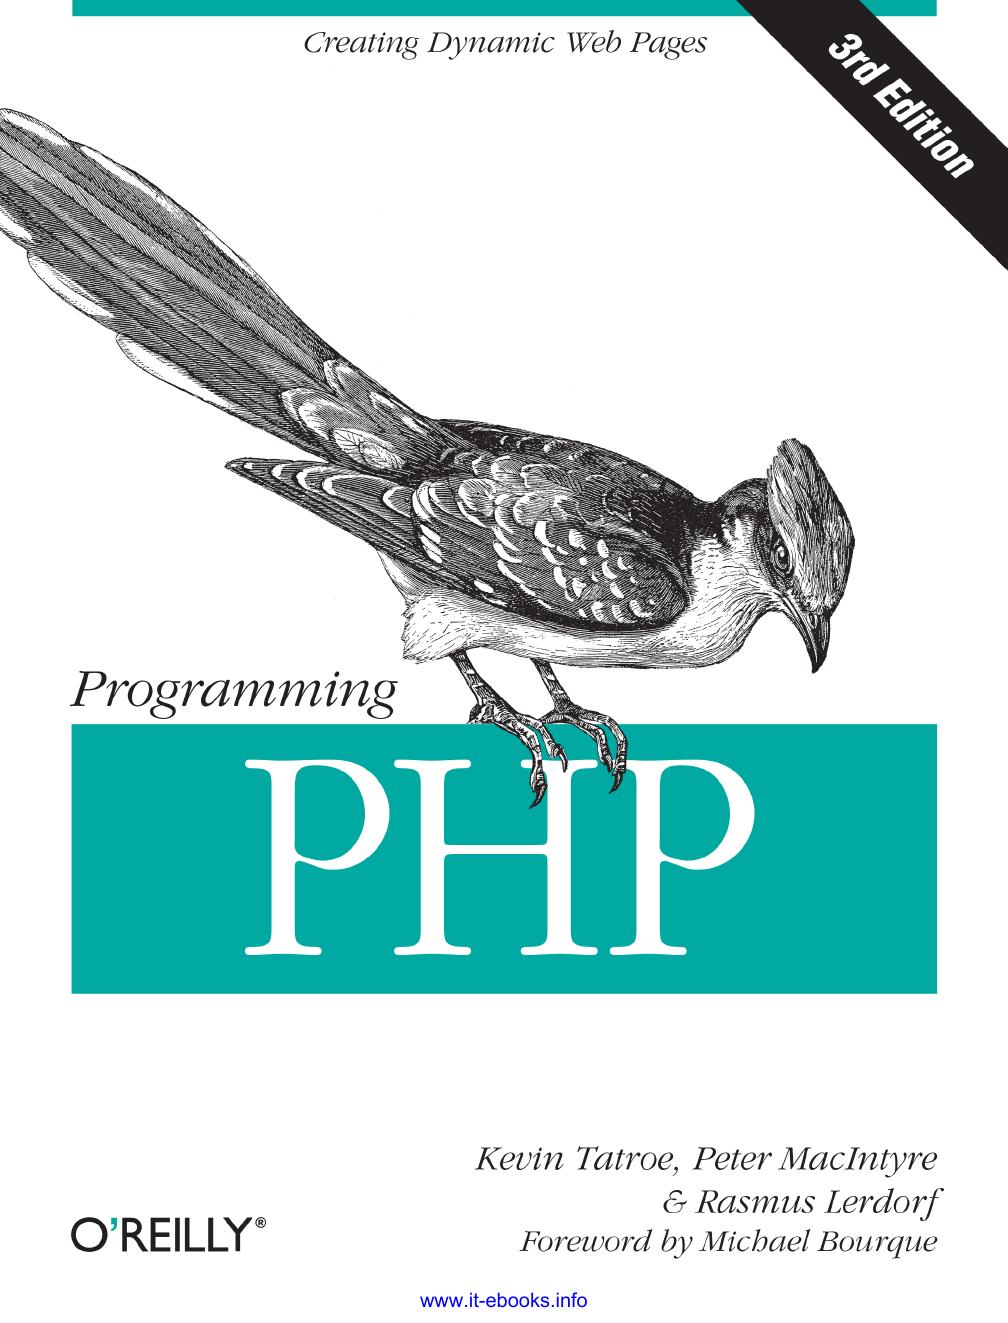 http://www.mediafire.com/view/cgx73afhad4g5xk/Programming_PHP,_3rd_Edition.pdf